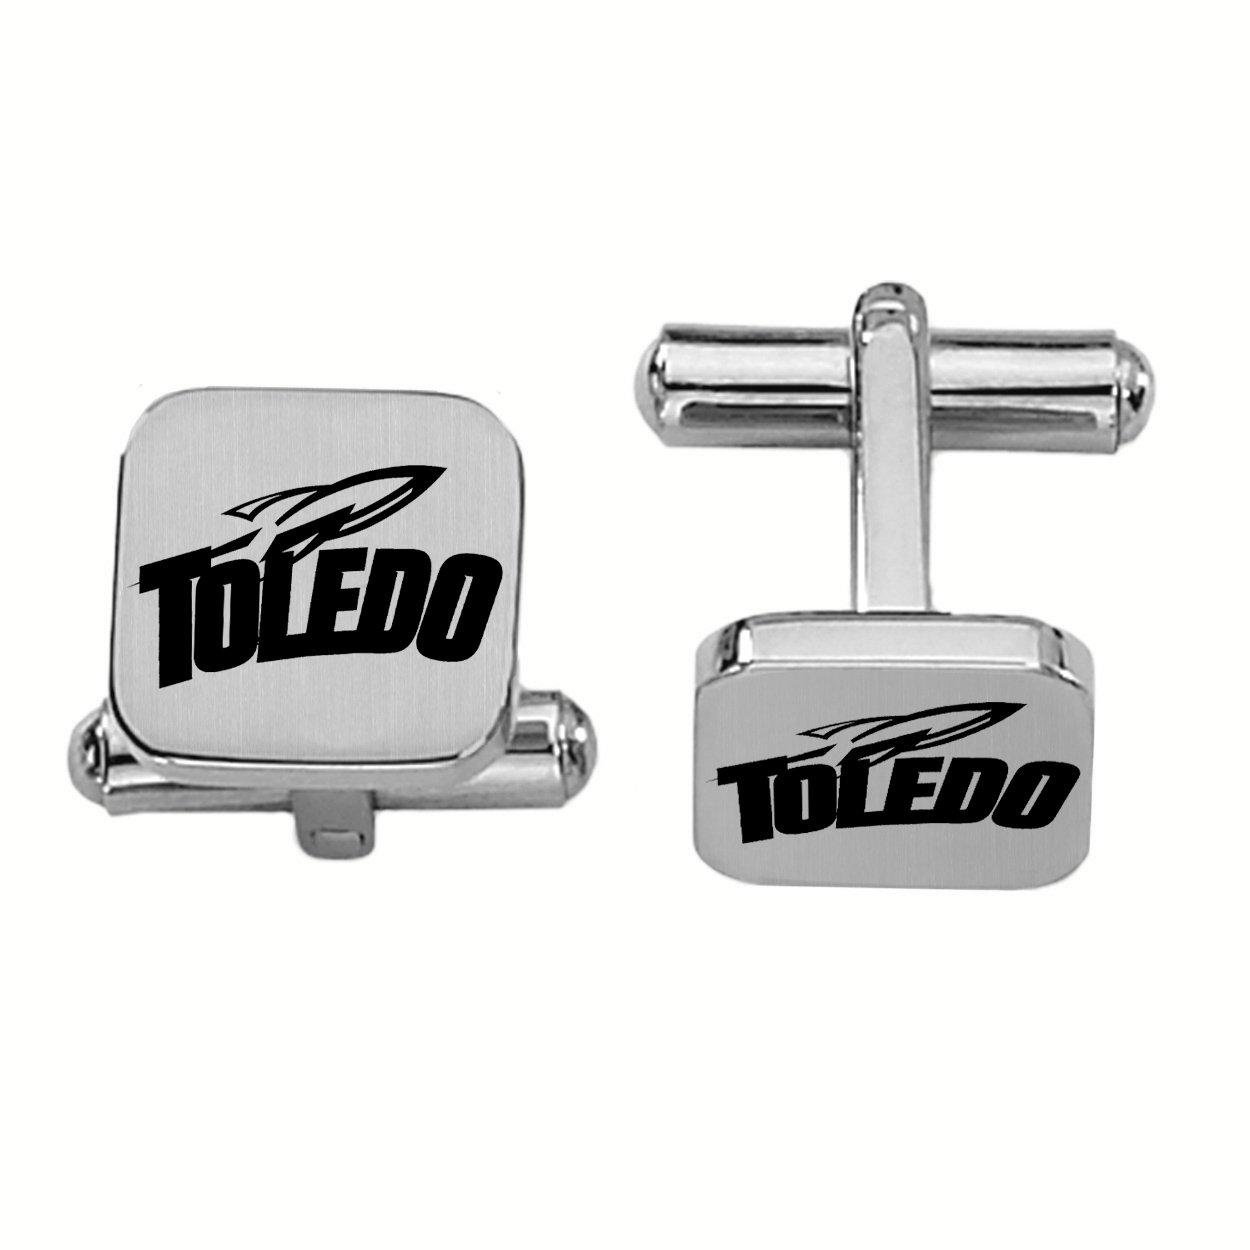 Toledo RocketsステンレススチールSquare Cufflinks   B00MEL9VXU